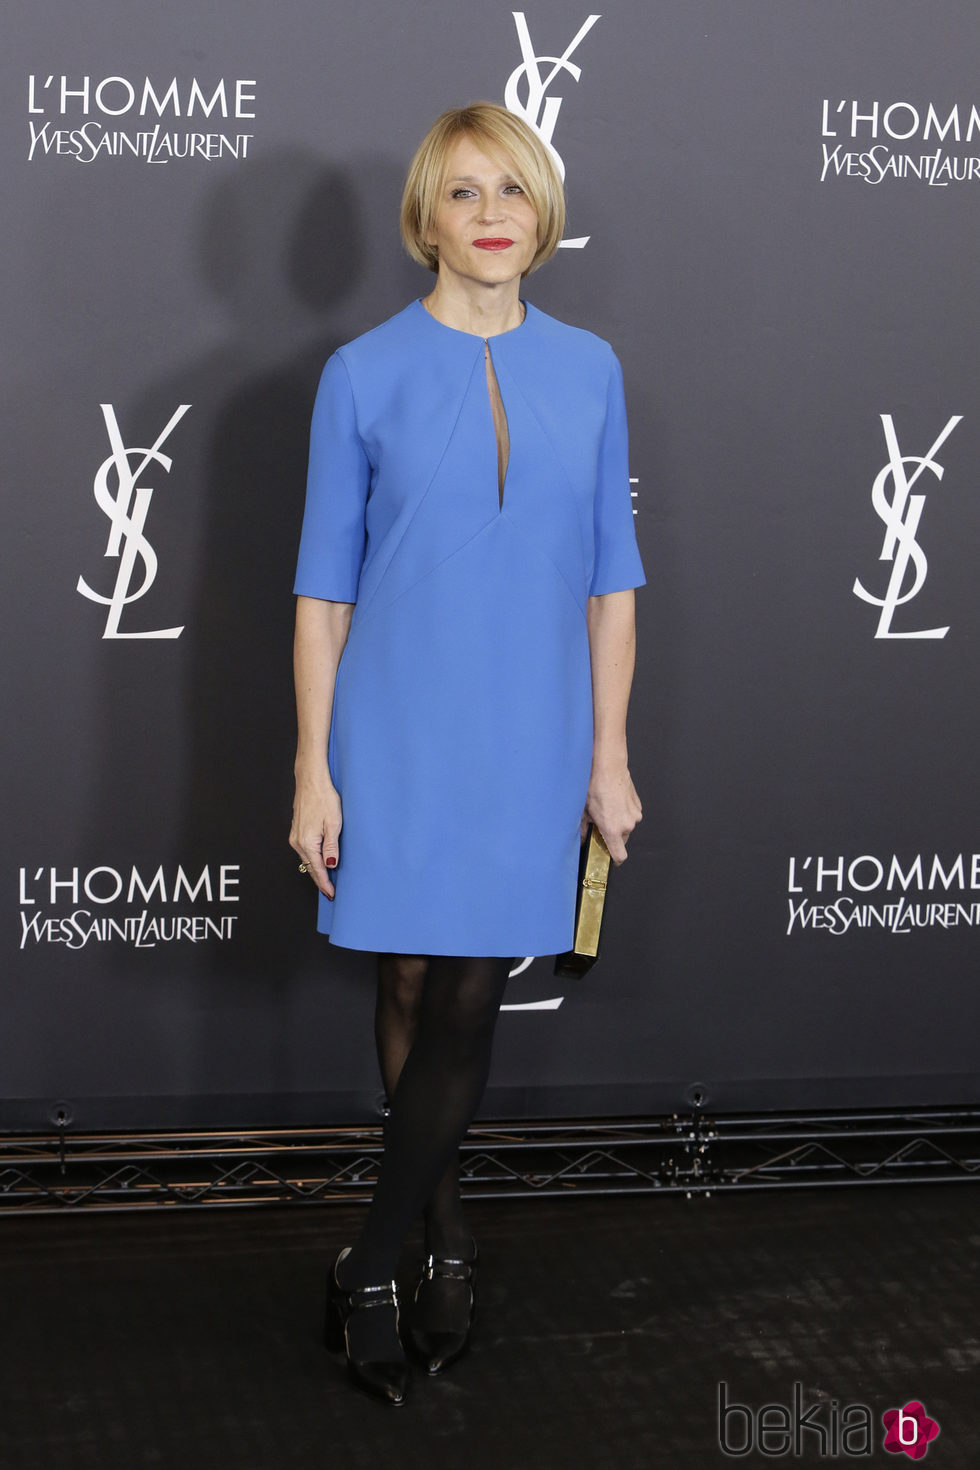 Antonia San Juan en el aniversario del perfume 'L'Homme' de Yves Saint Laurent en Madrid